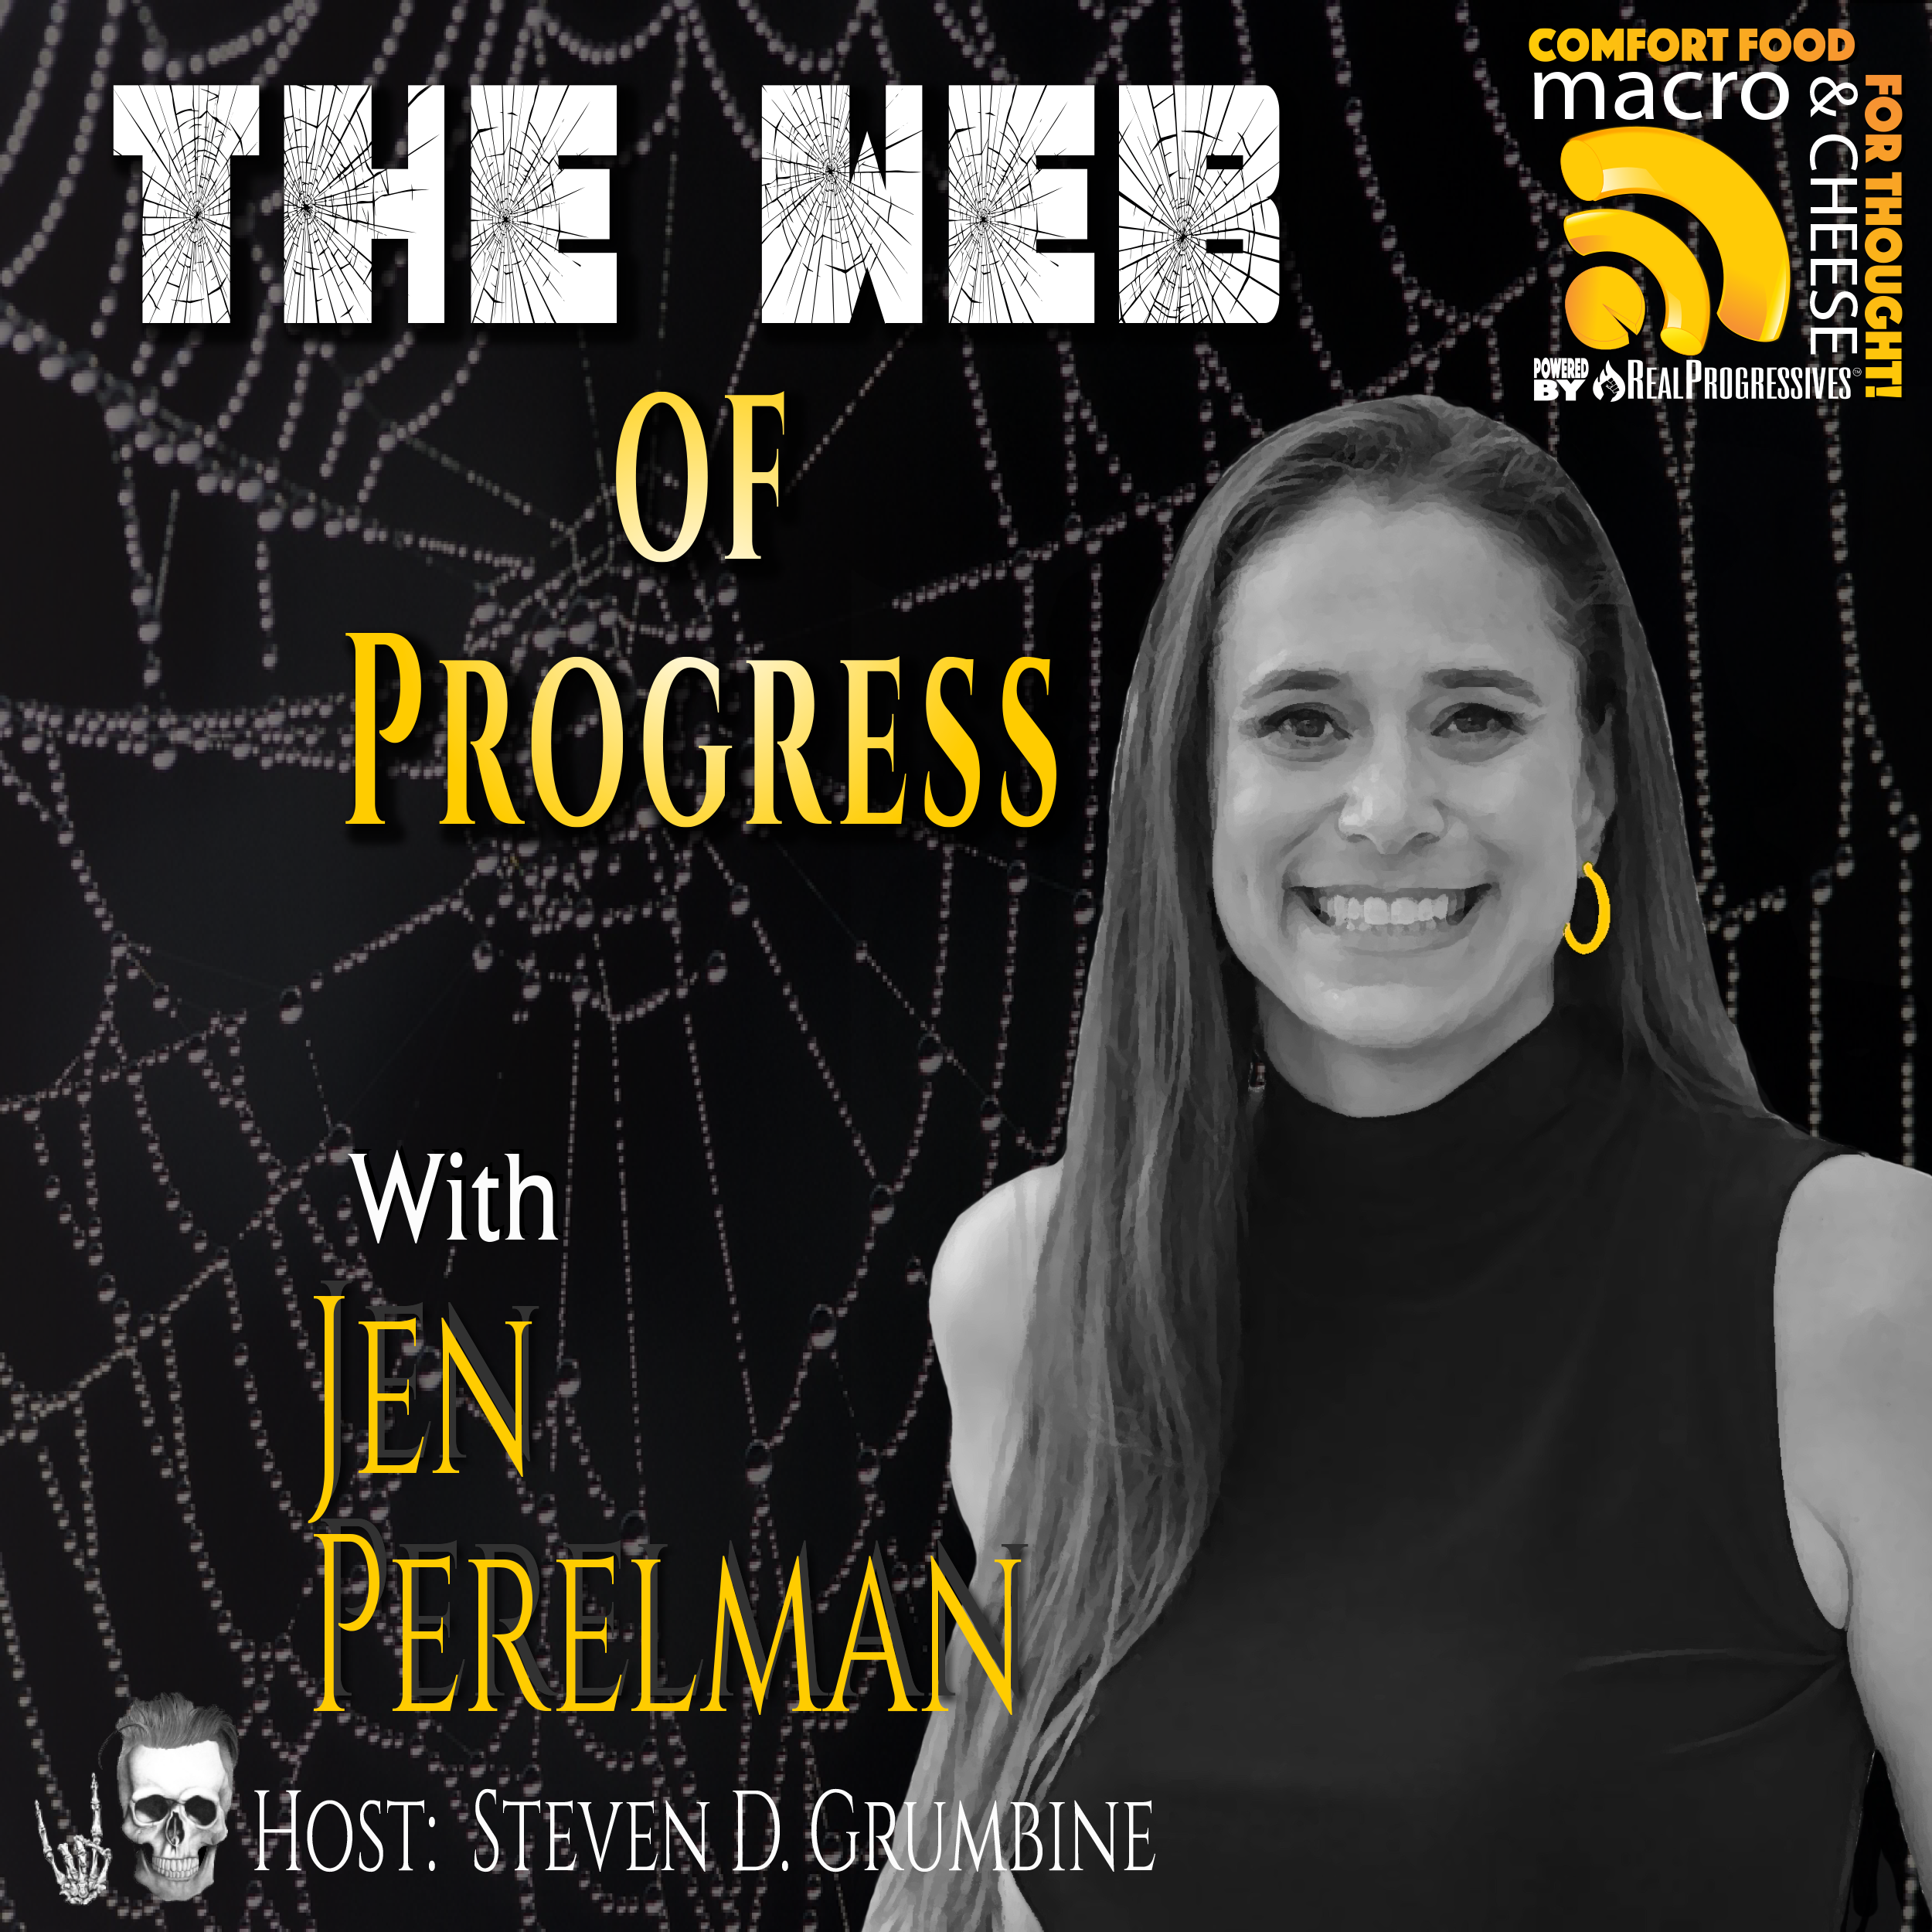 The Web of Progress with Jen Perelman